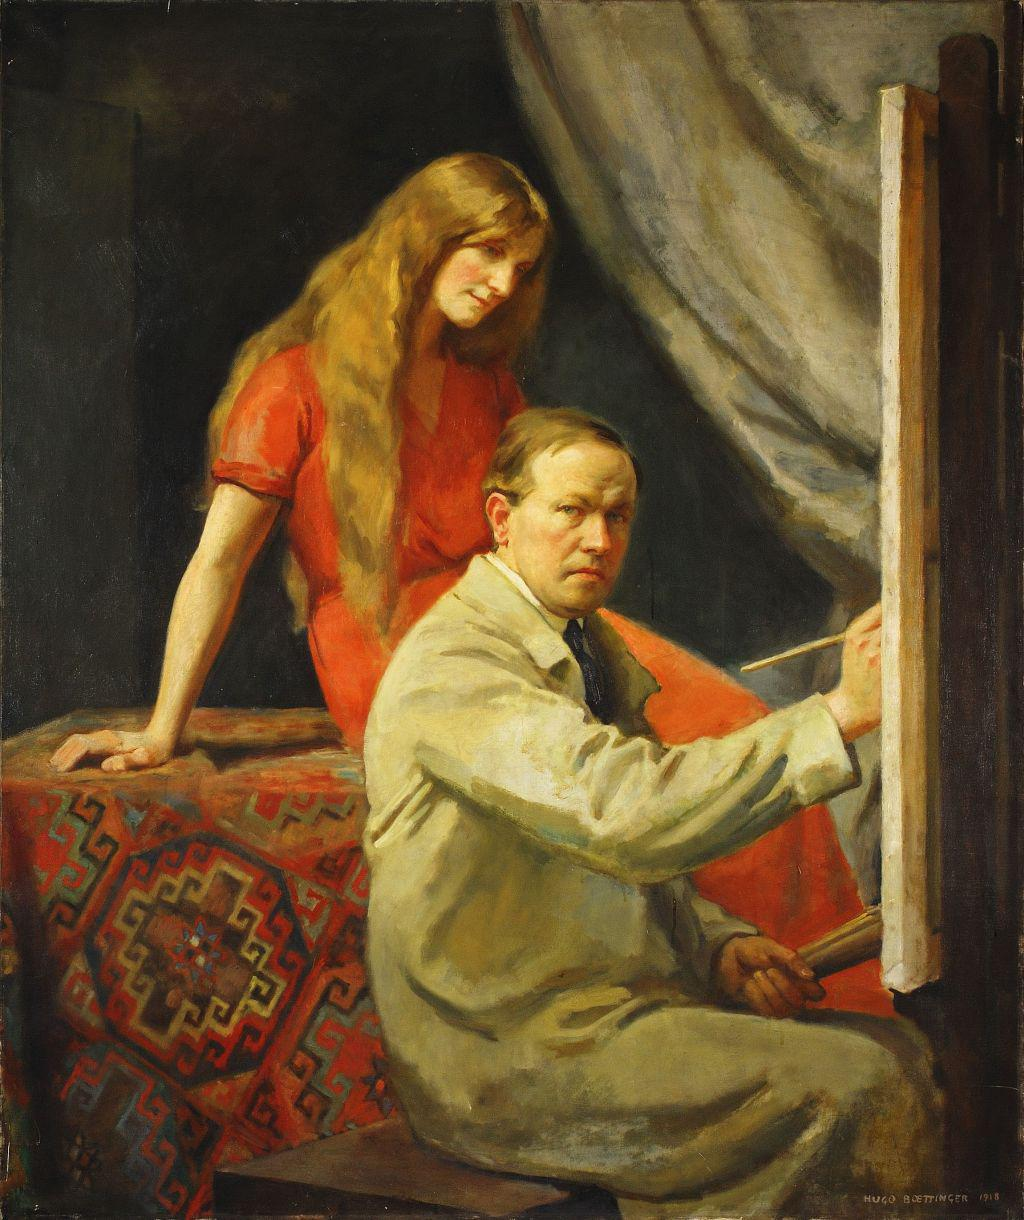 Hugo Boettinger / Umělec a jeho choť, 1918